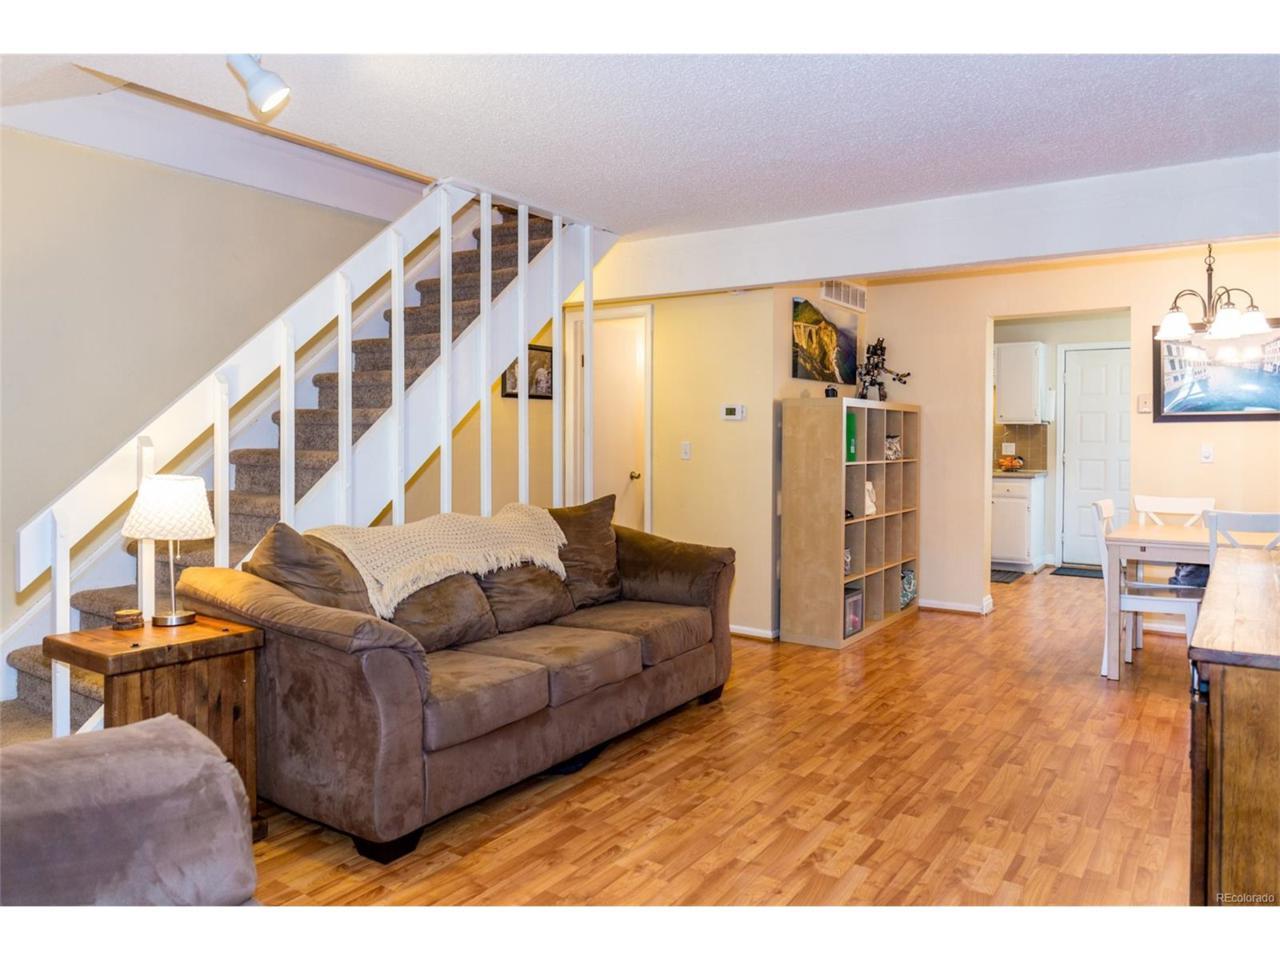 1541 S Owens Street #51, Lakewood, CO 80232 (MLS #4659312) :: 8z Real Estate